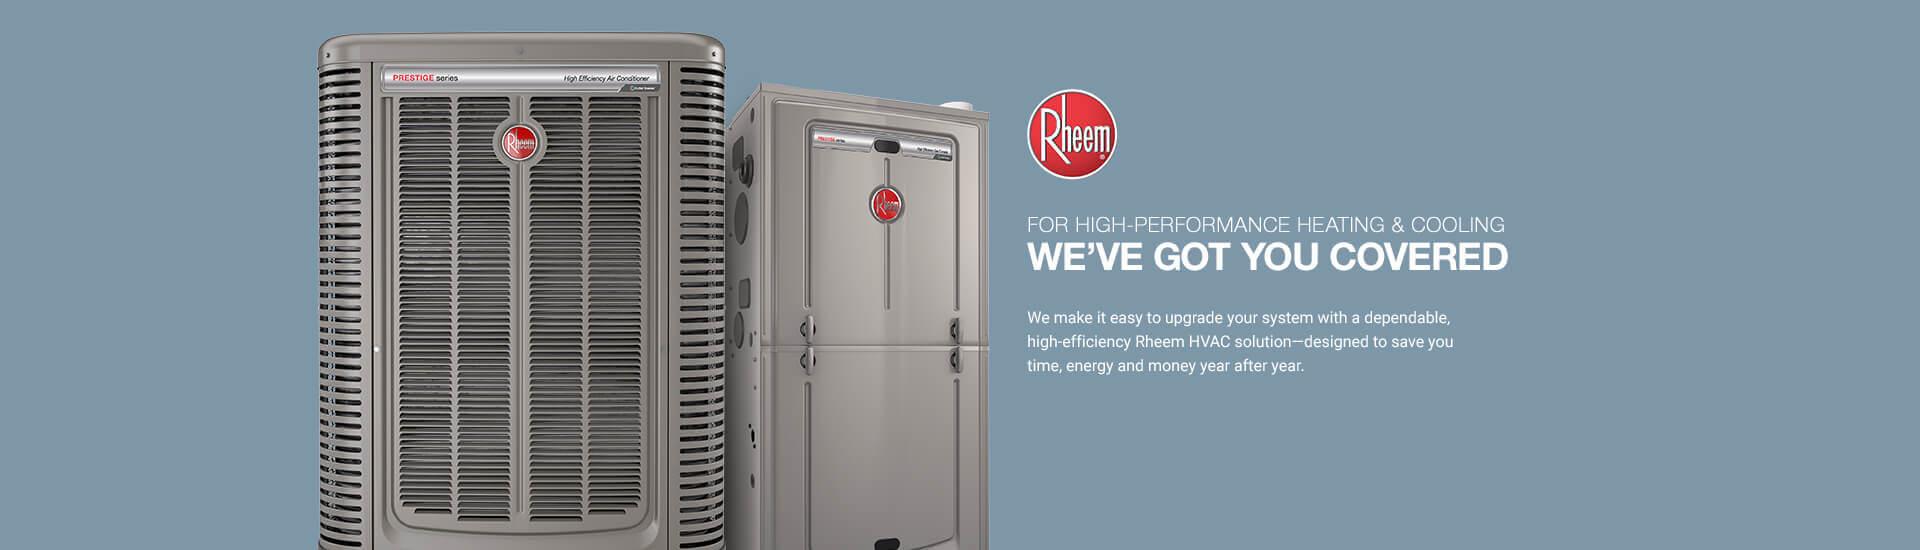 New Rheem product